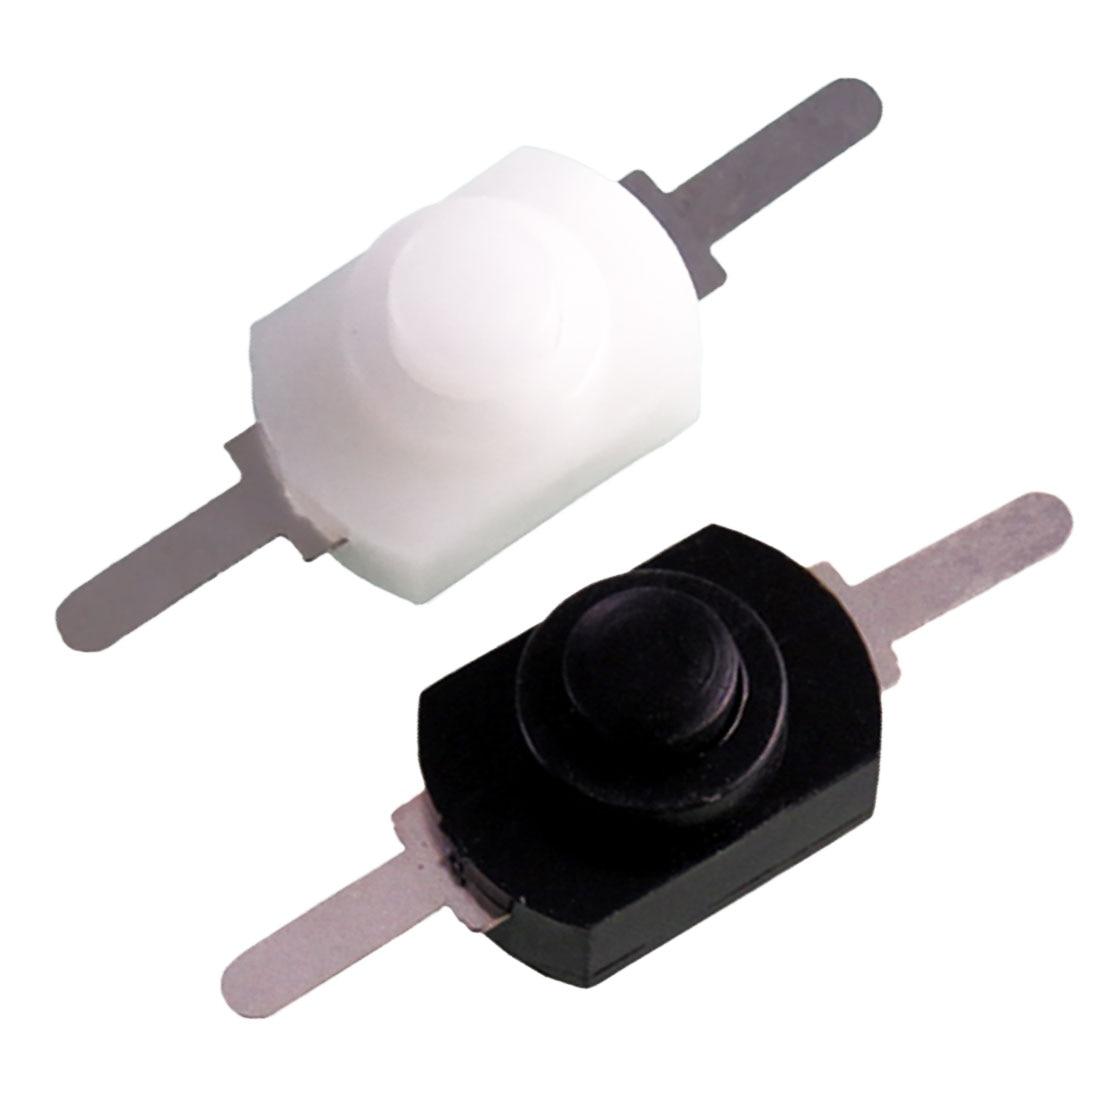 Hot sale 1pc/5pcs/10pcs1A 30V DC 250V White/Black Latching On Off Mini Torch Push Button Switch